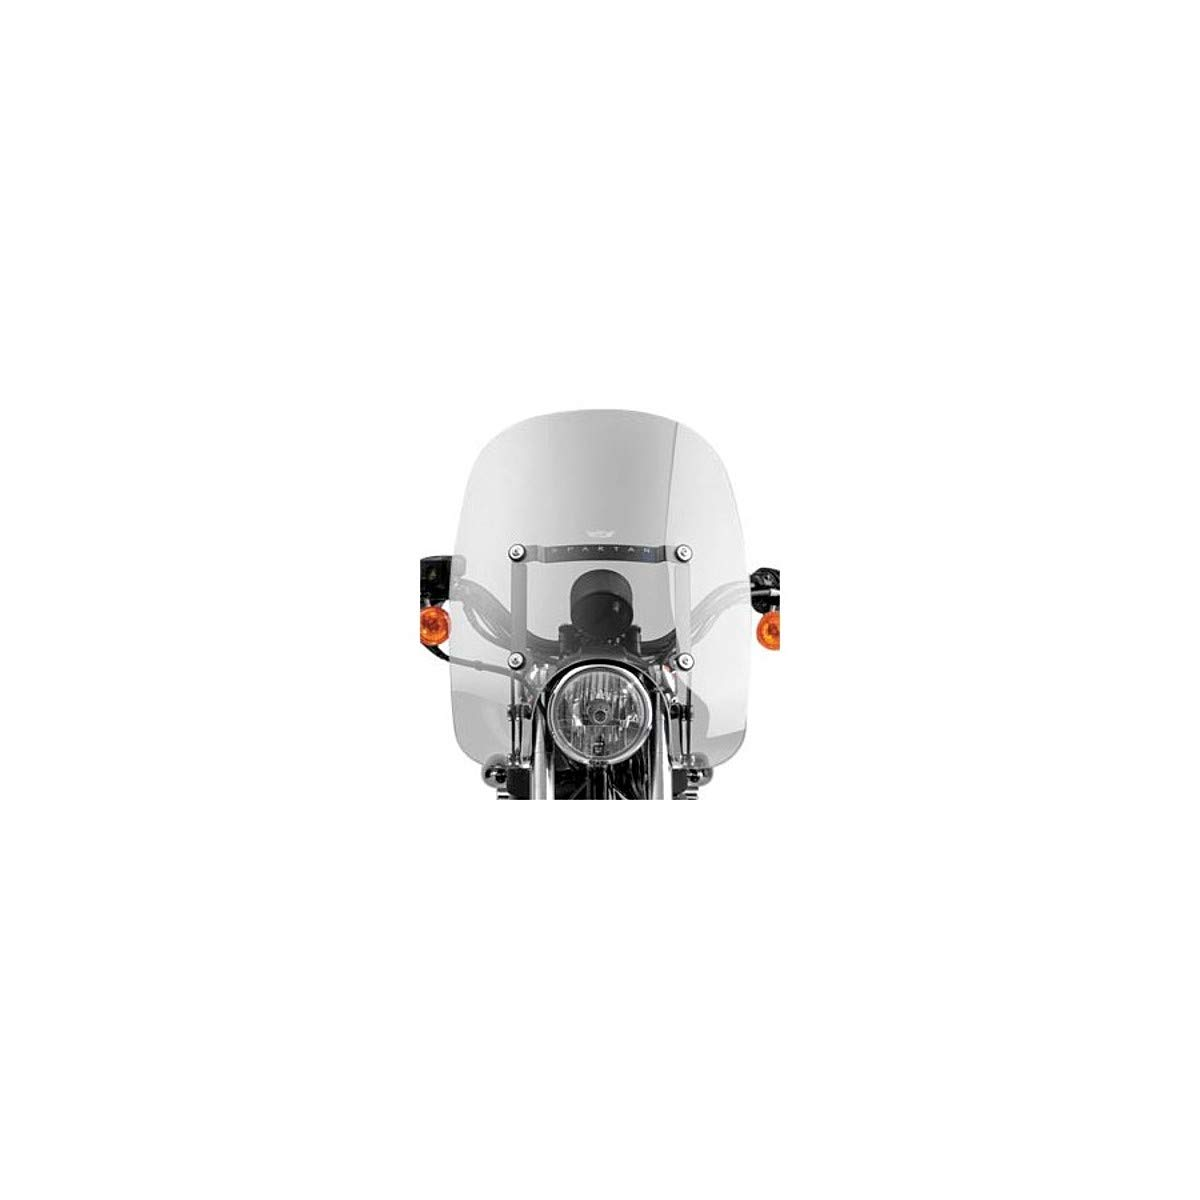 Arctic Cat New OEM Water Thermostat,Fire,Saber,Crossfire,FireCat,SaberCat,M5,M6